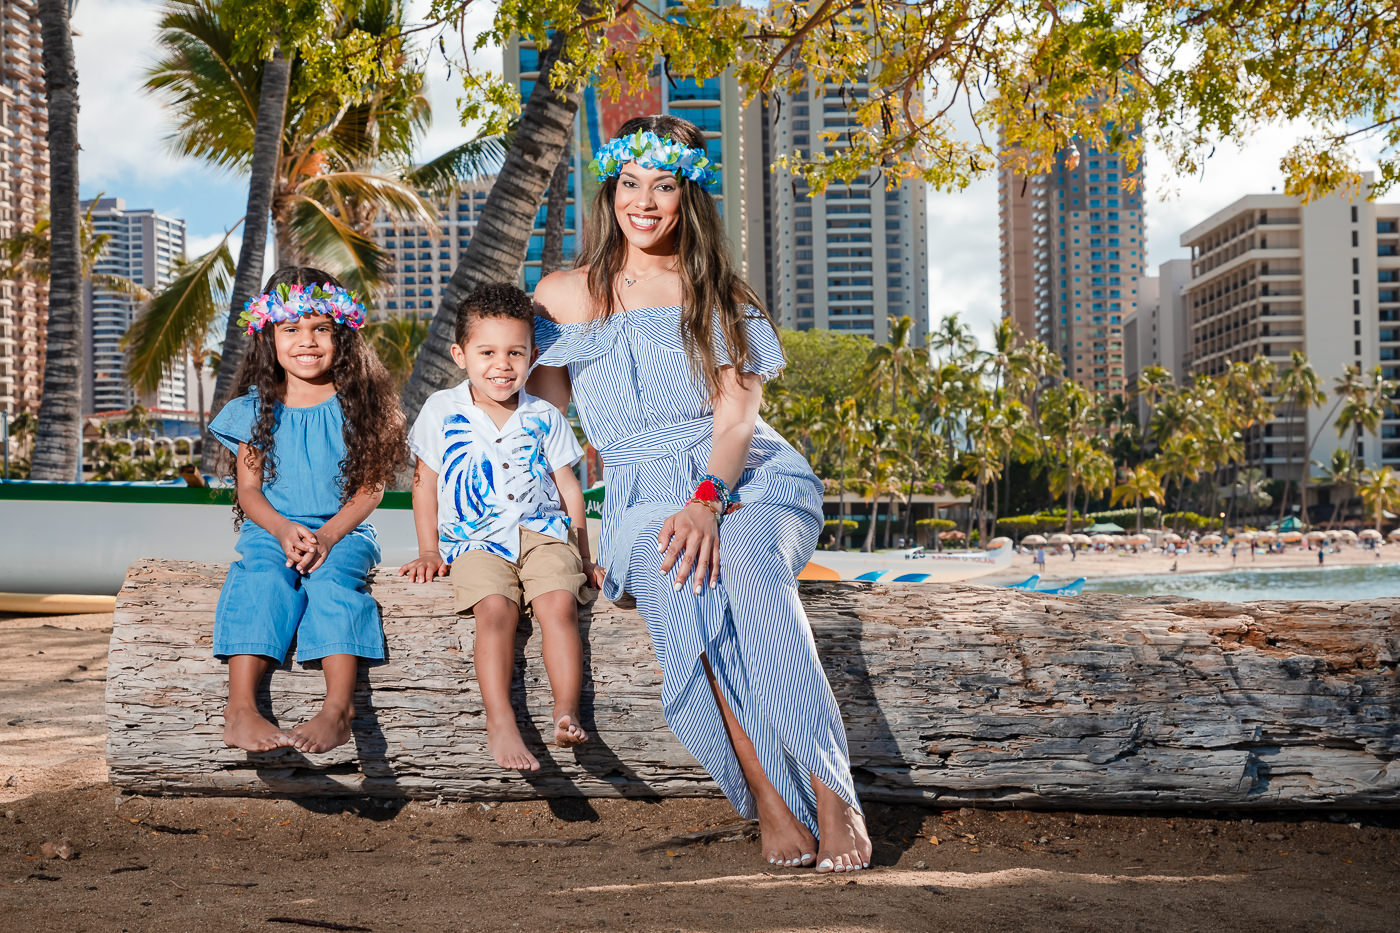 Oahu2019-3056.jpg